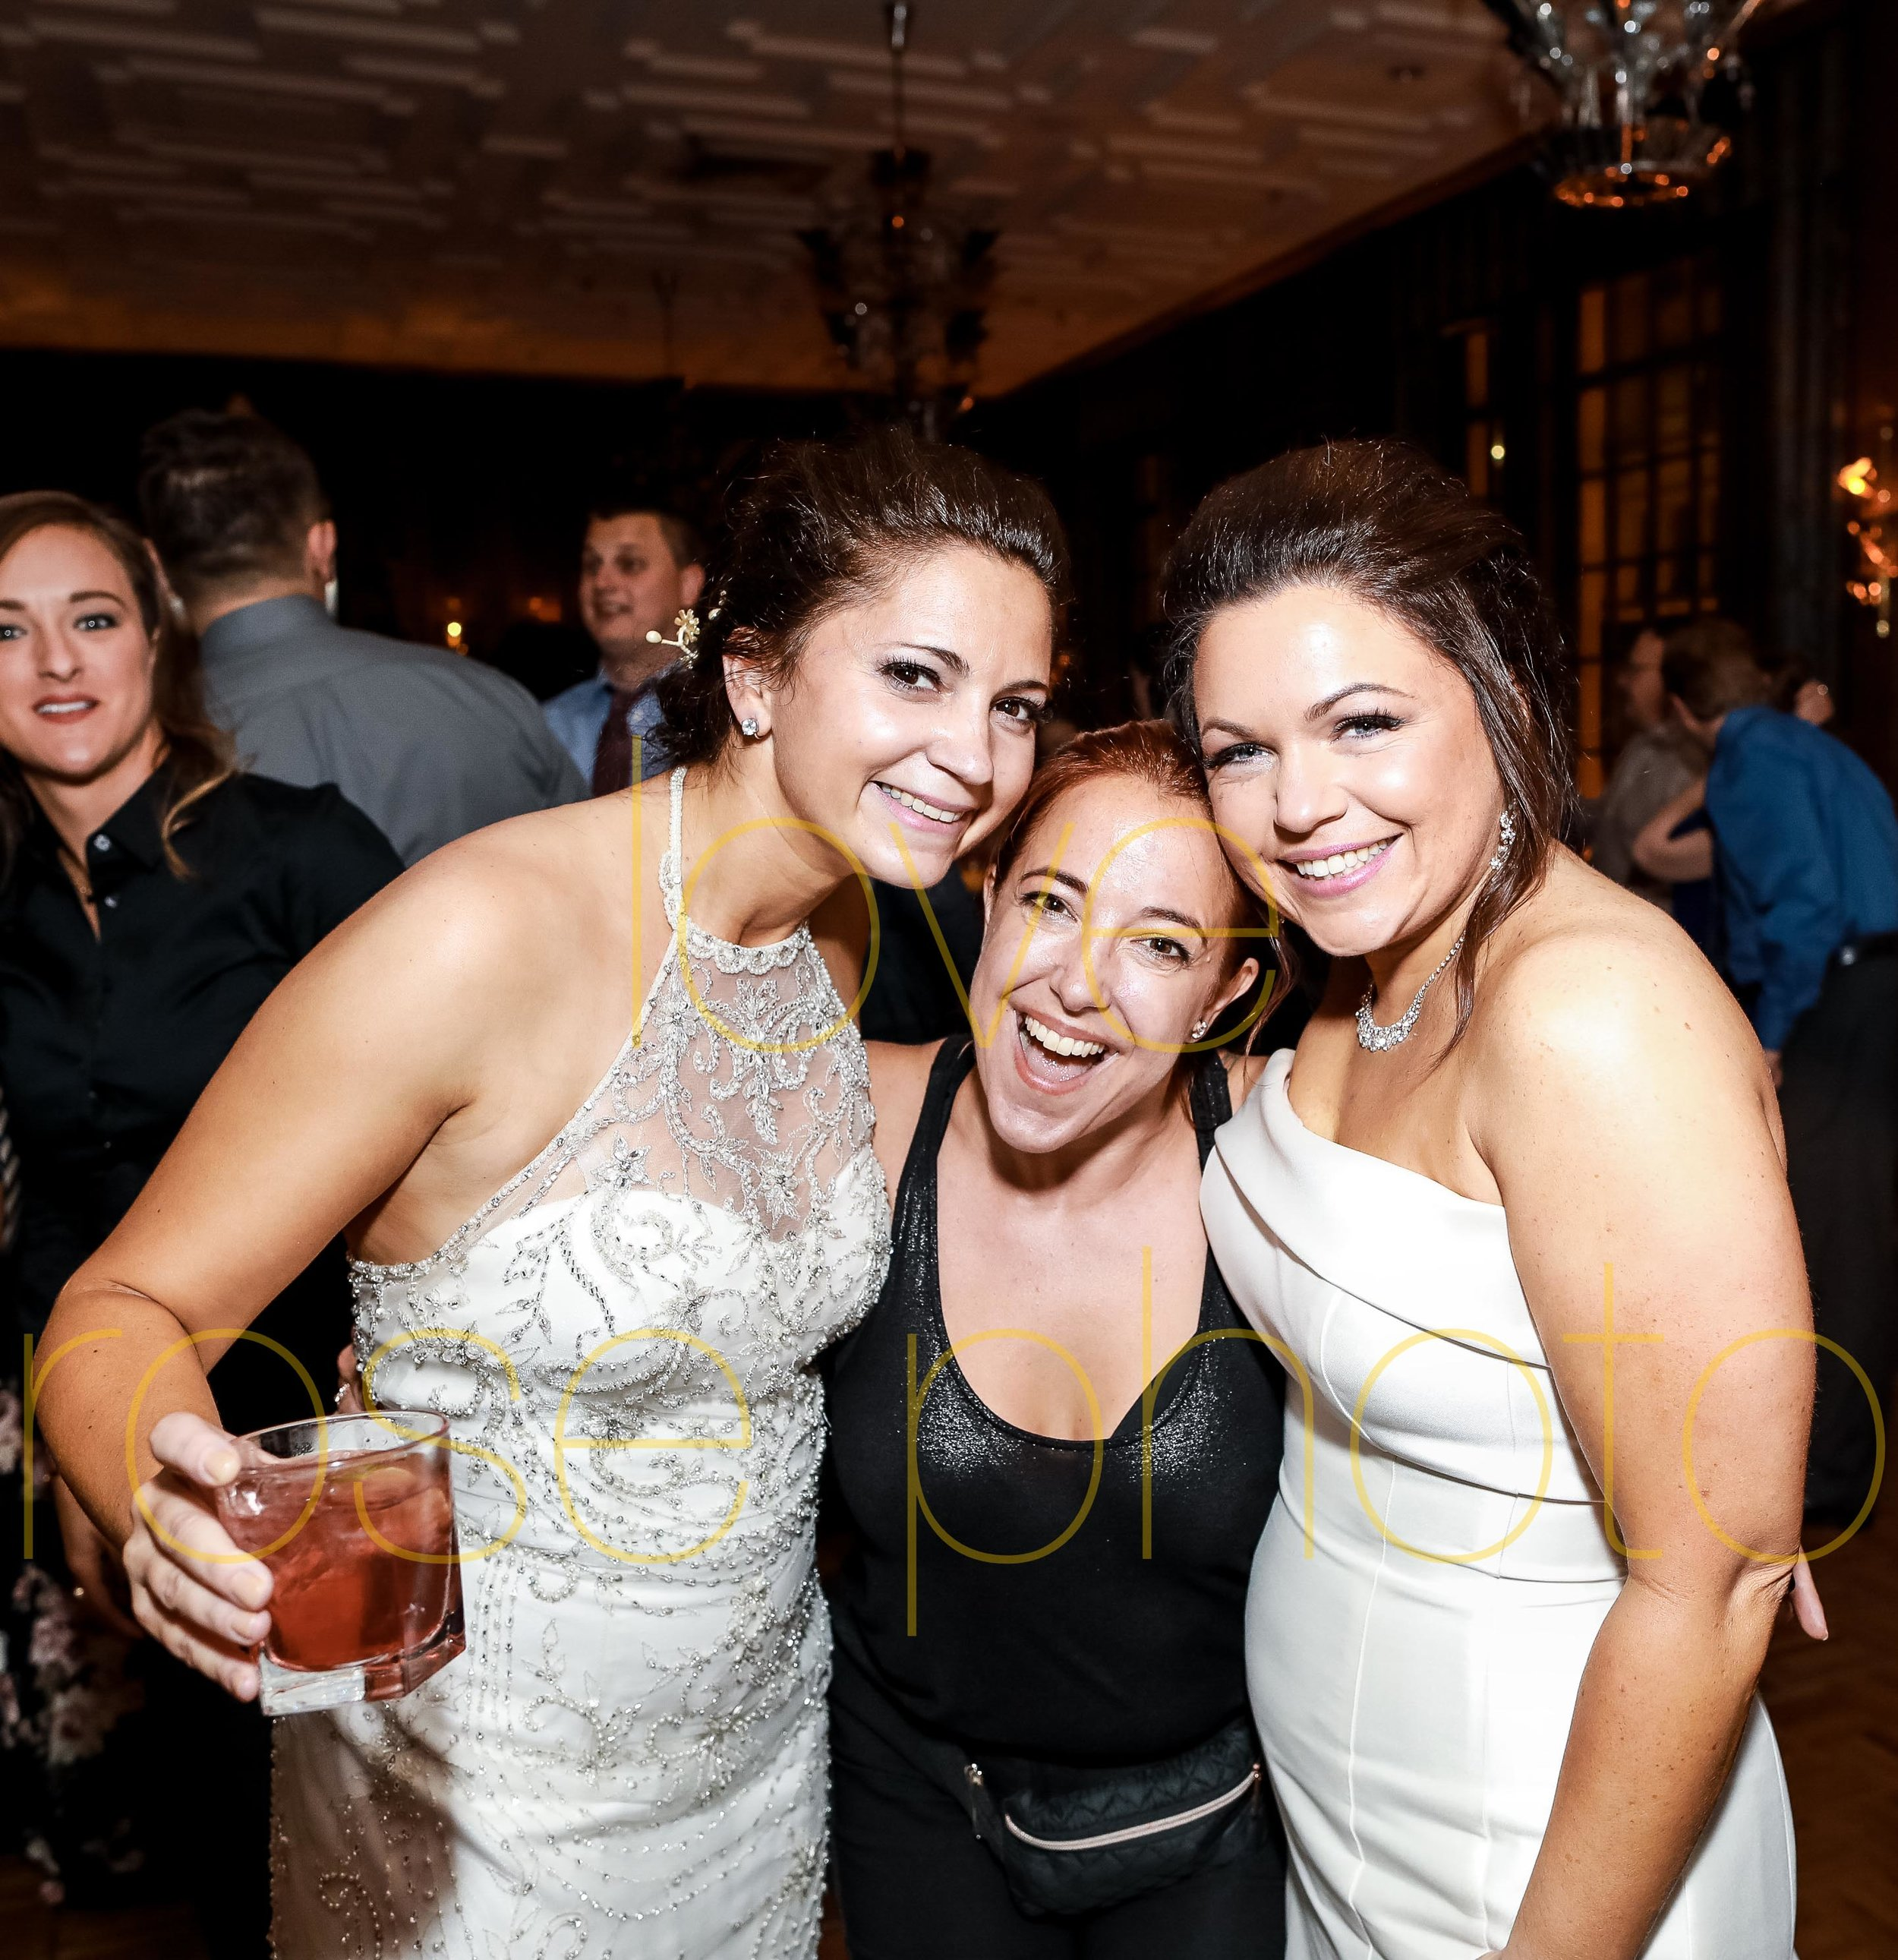 sophie + melissa love rose photo gay wedding chicago pride 2019 -87.jpg